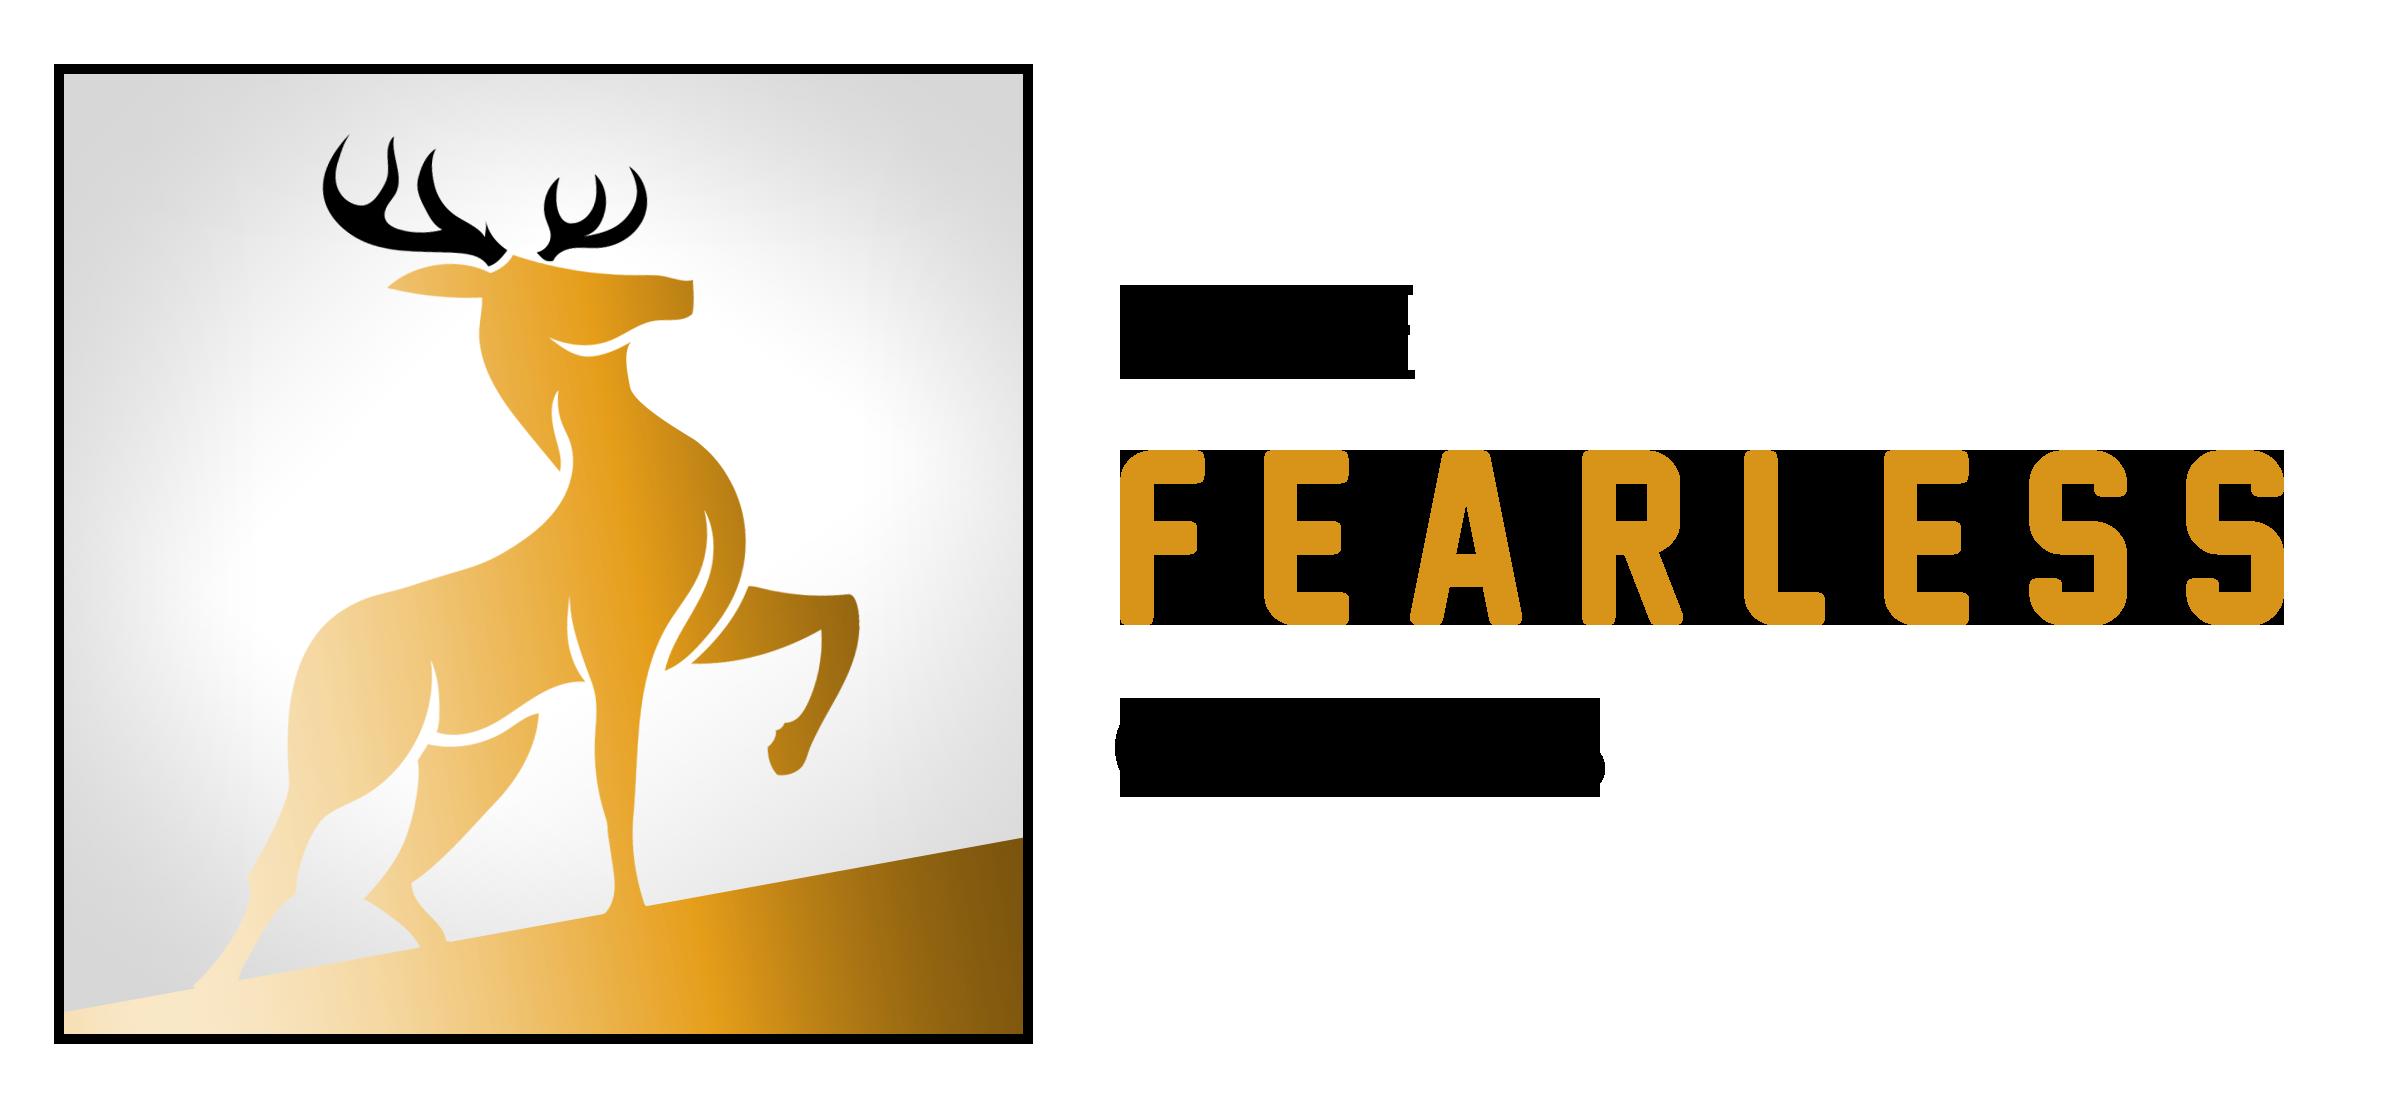 Lxccximoriomlm8biv3d fearlessclimb logo horizontal final